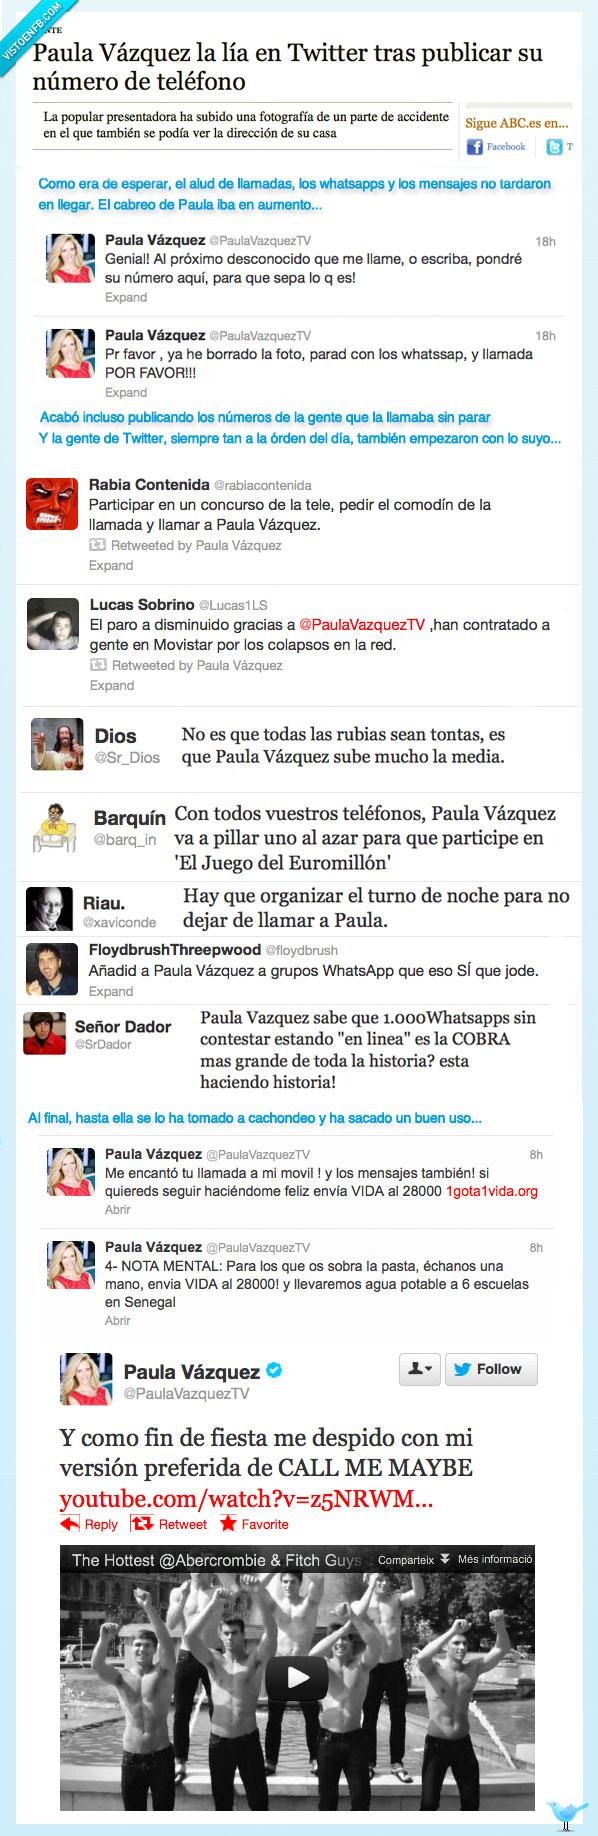 error,paula,telefono,trolls,twitter,vazquez